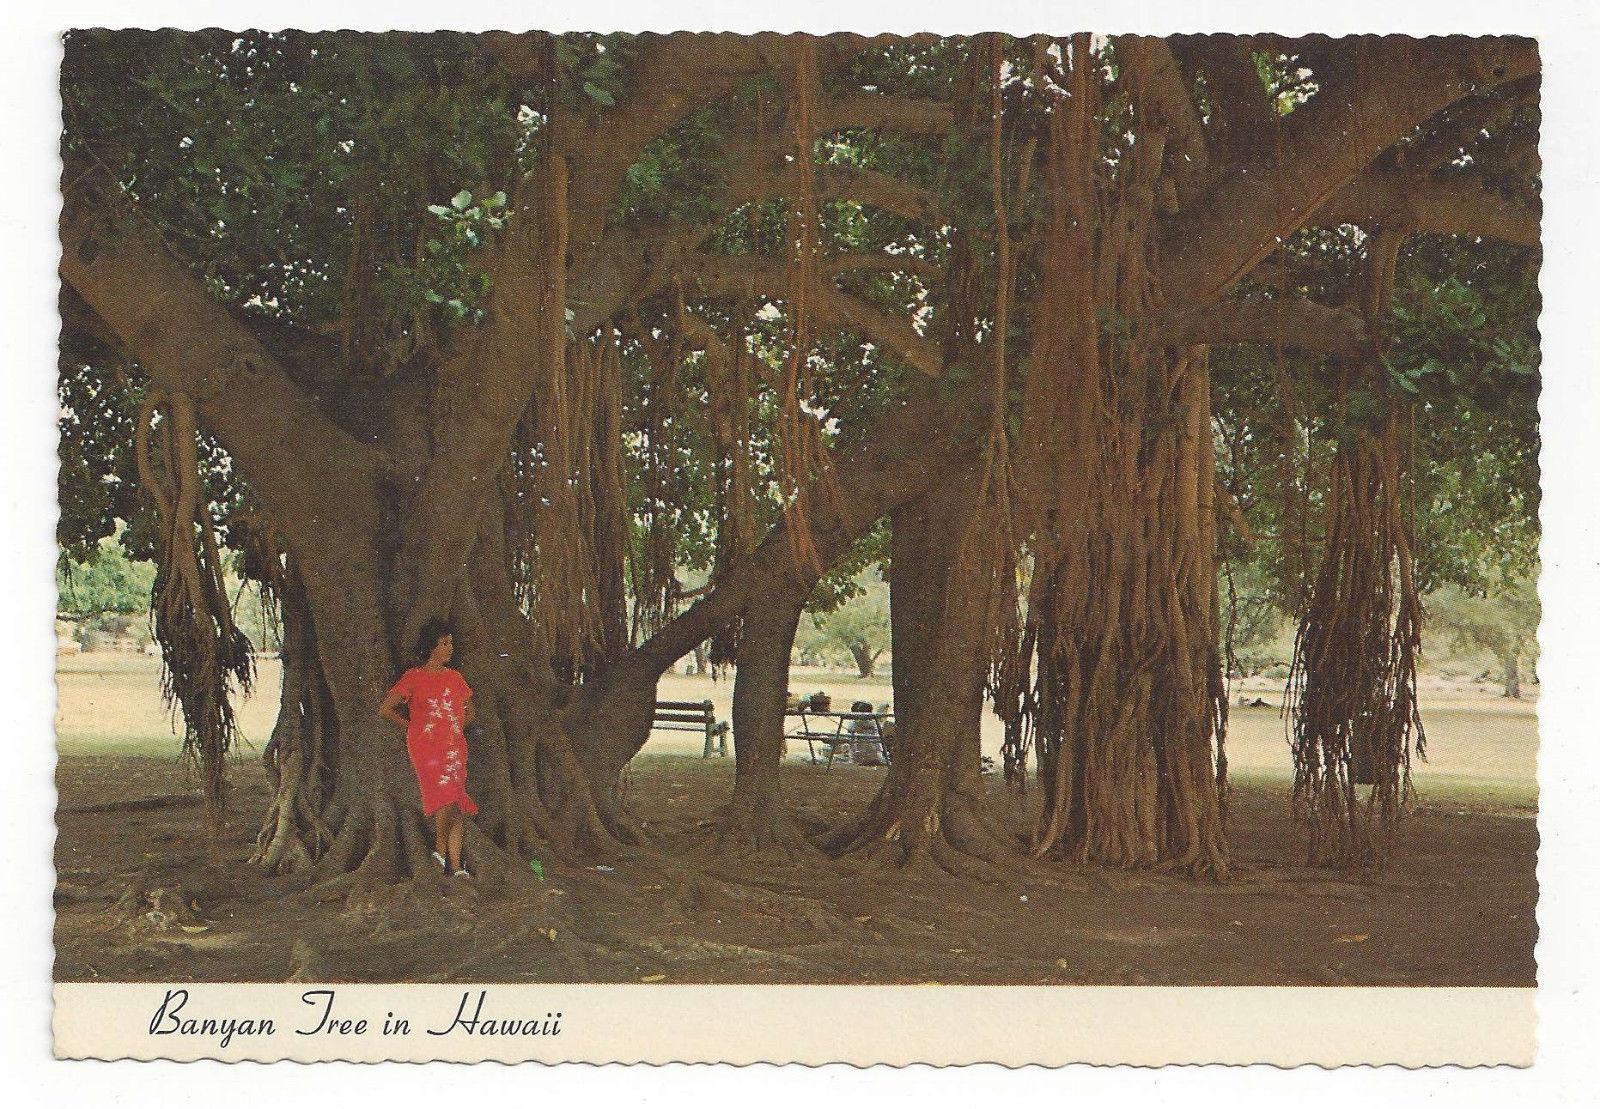 Hawaii Banyan Tree Vtg Chrome Postcard 4X6 Ted Birckhead Photo